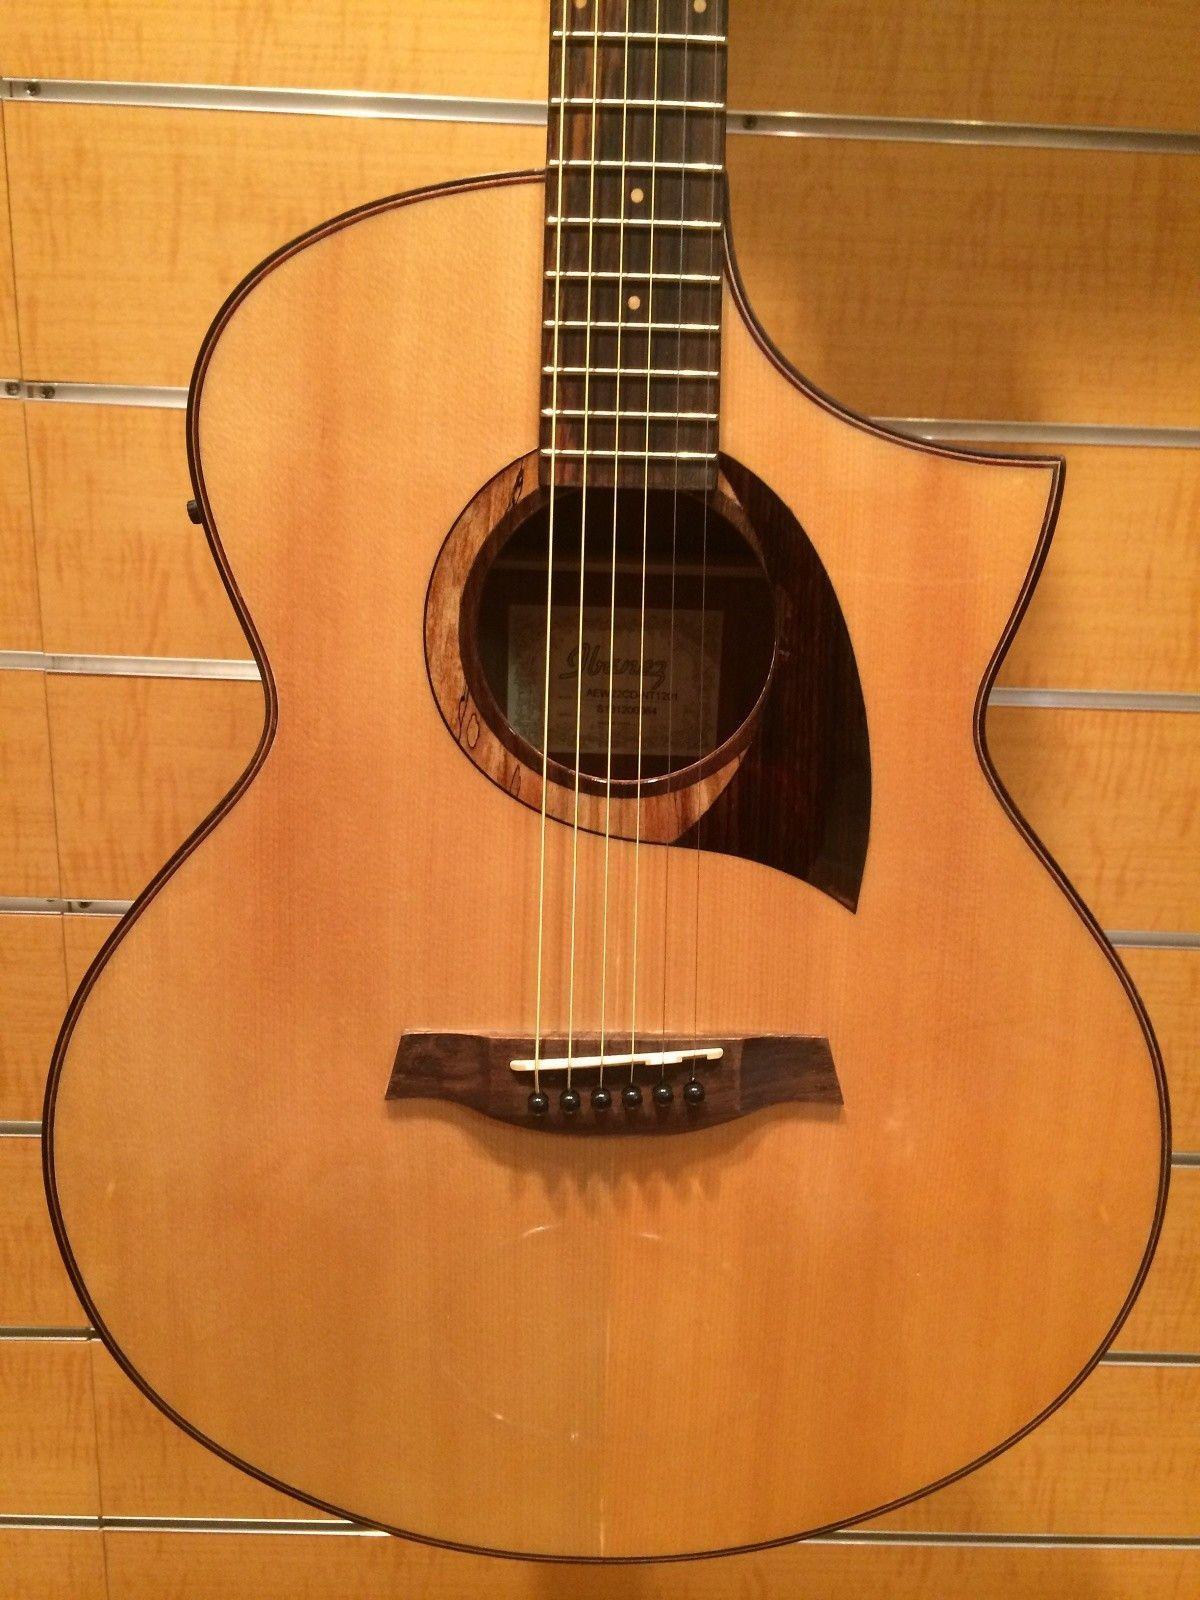 Ibanez AEW22CD NT Artwood Acoustic Electric Guitar